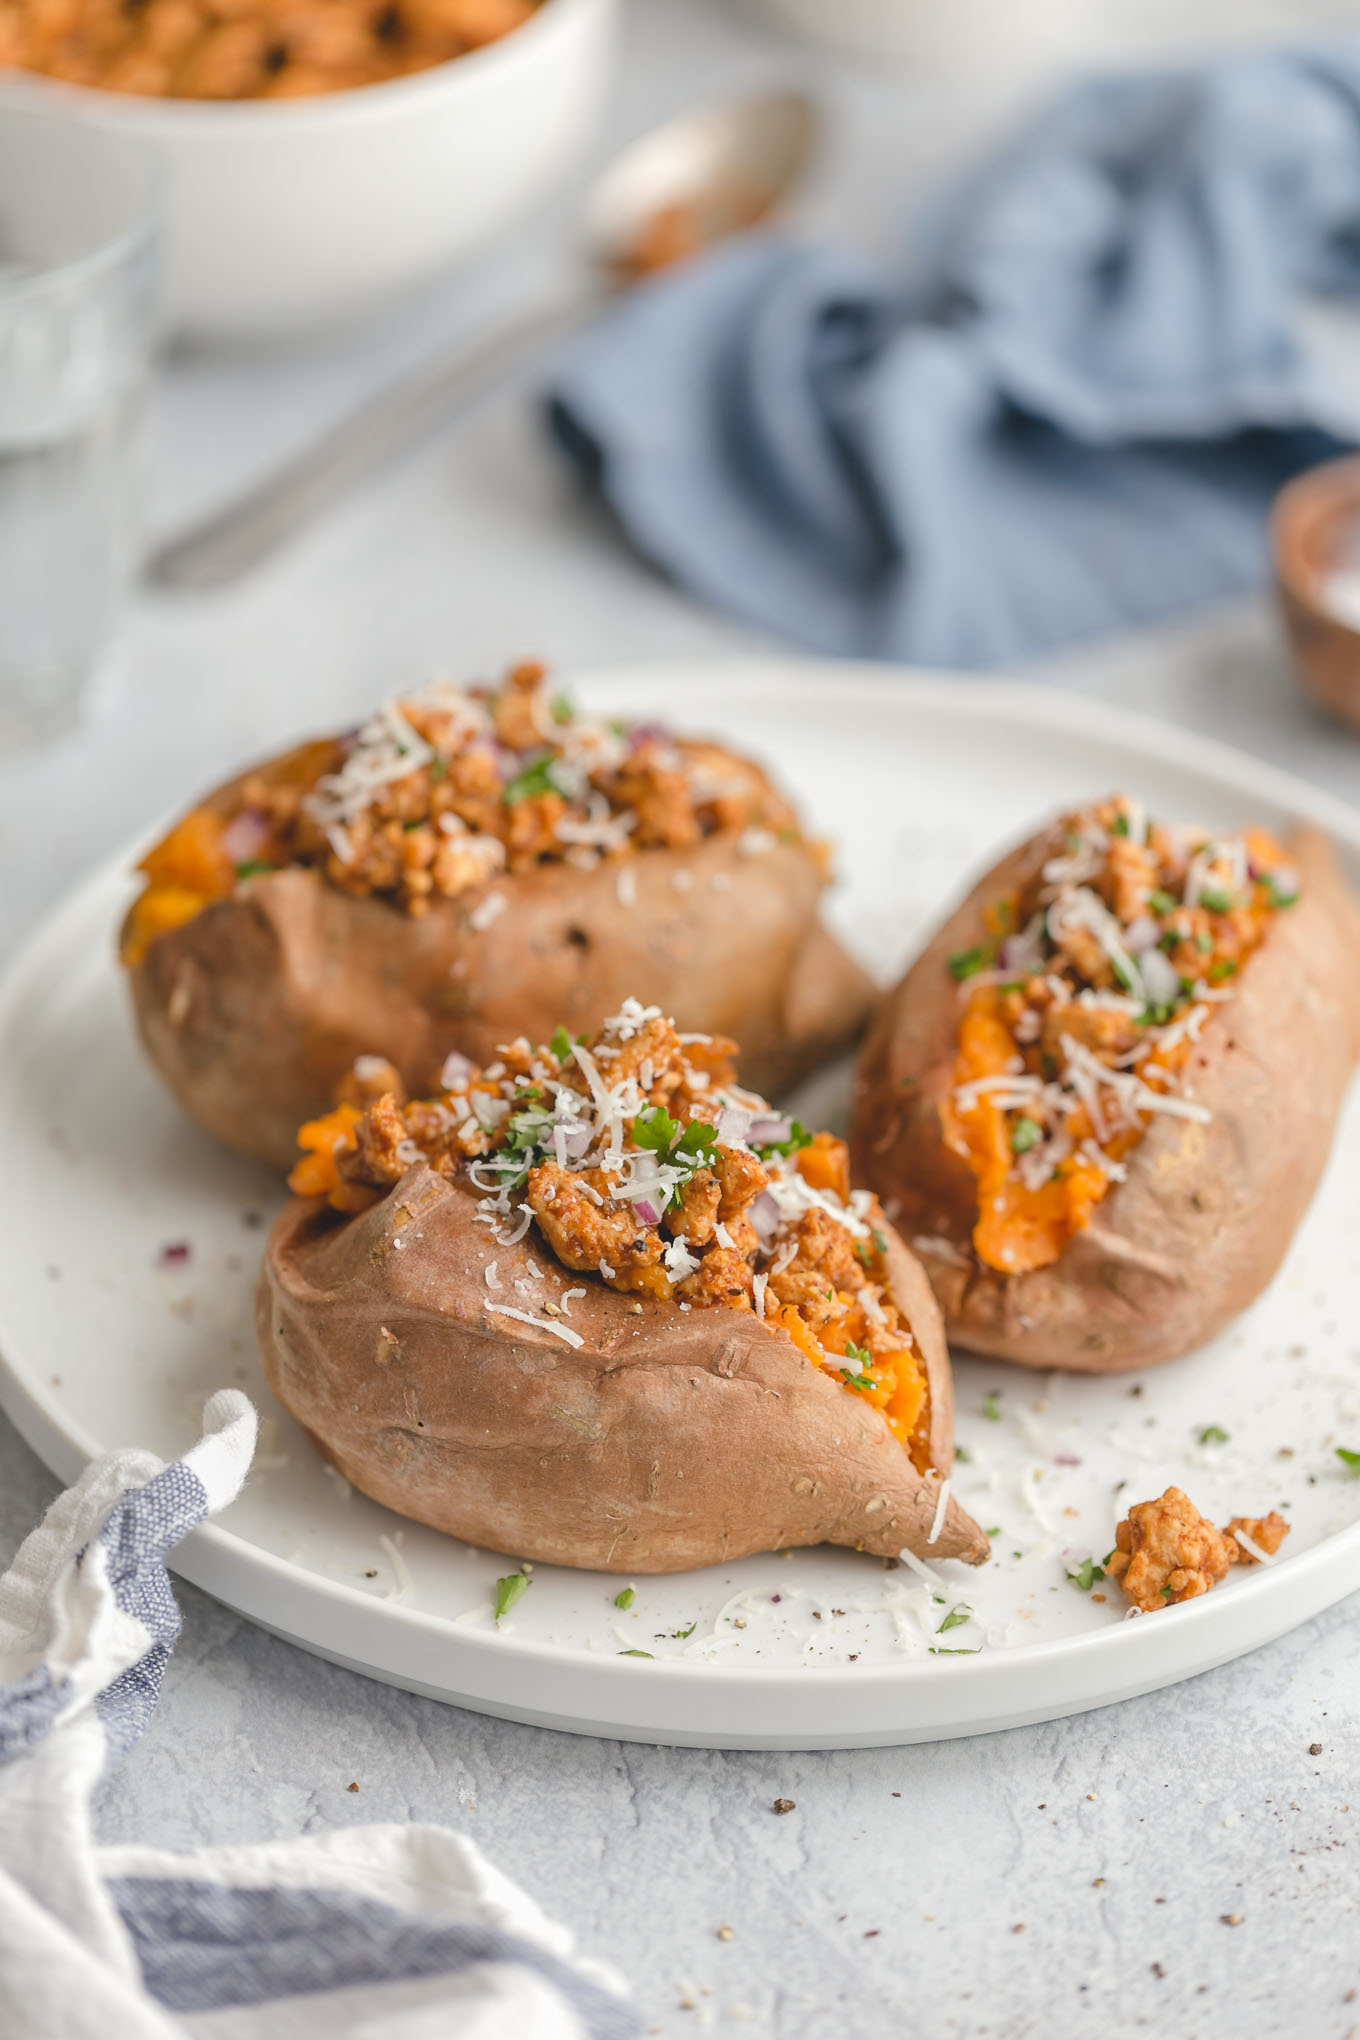 Healthy Stuffed Sweet Potatoes with Ground Turkey Taco Meat